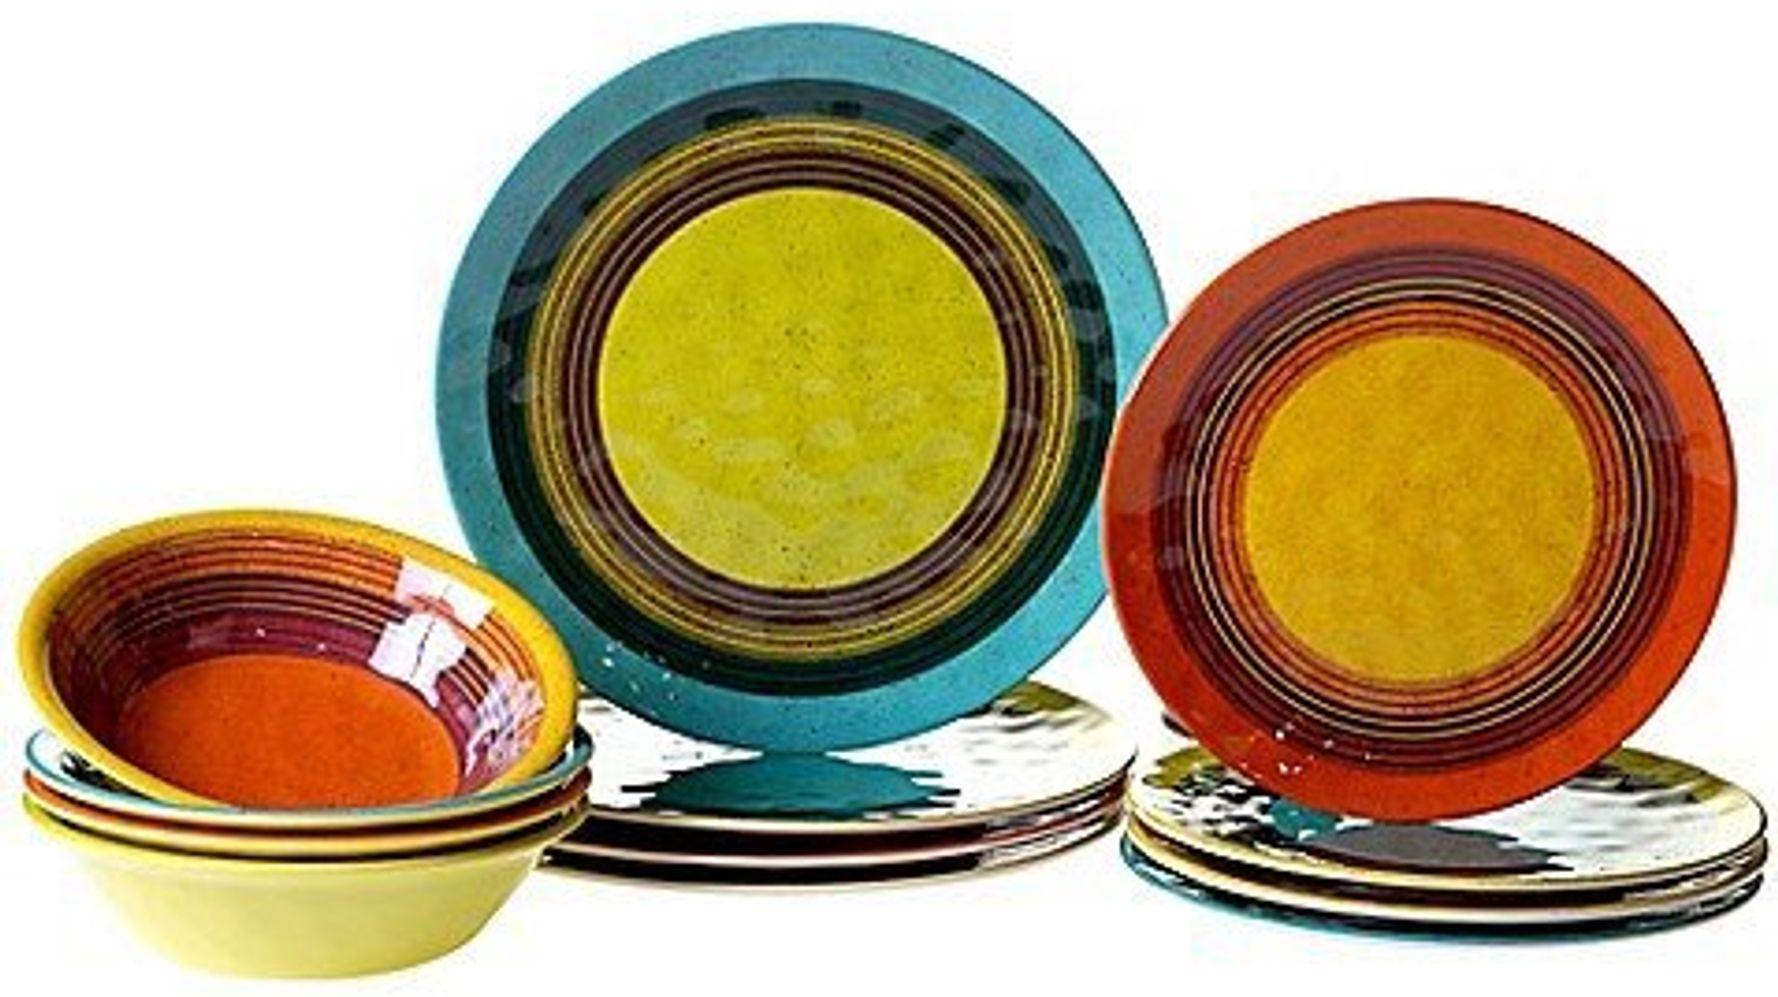 8 Durable Dinnerware Sets That Won't Break | HuffPost Life